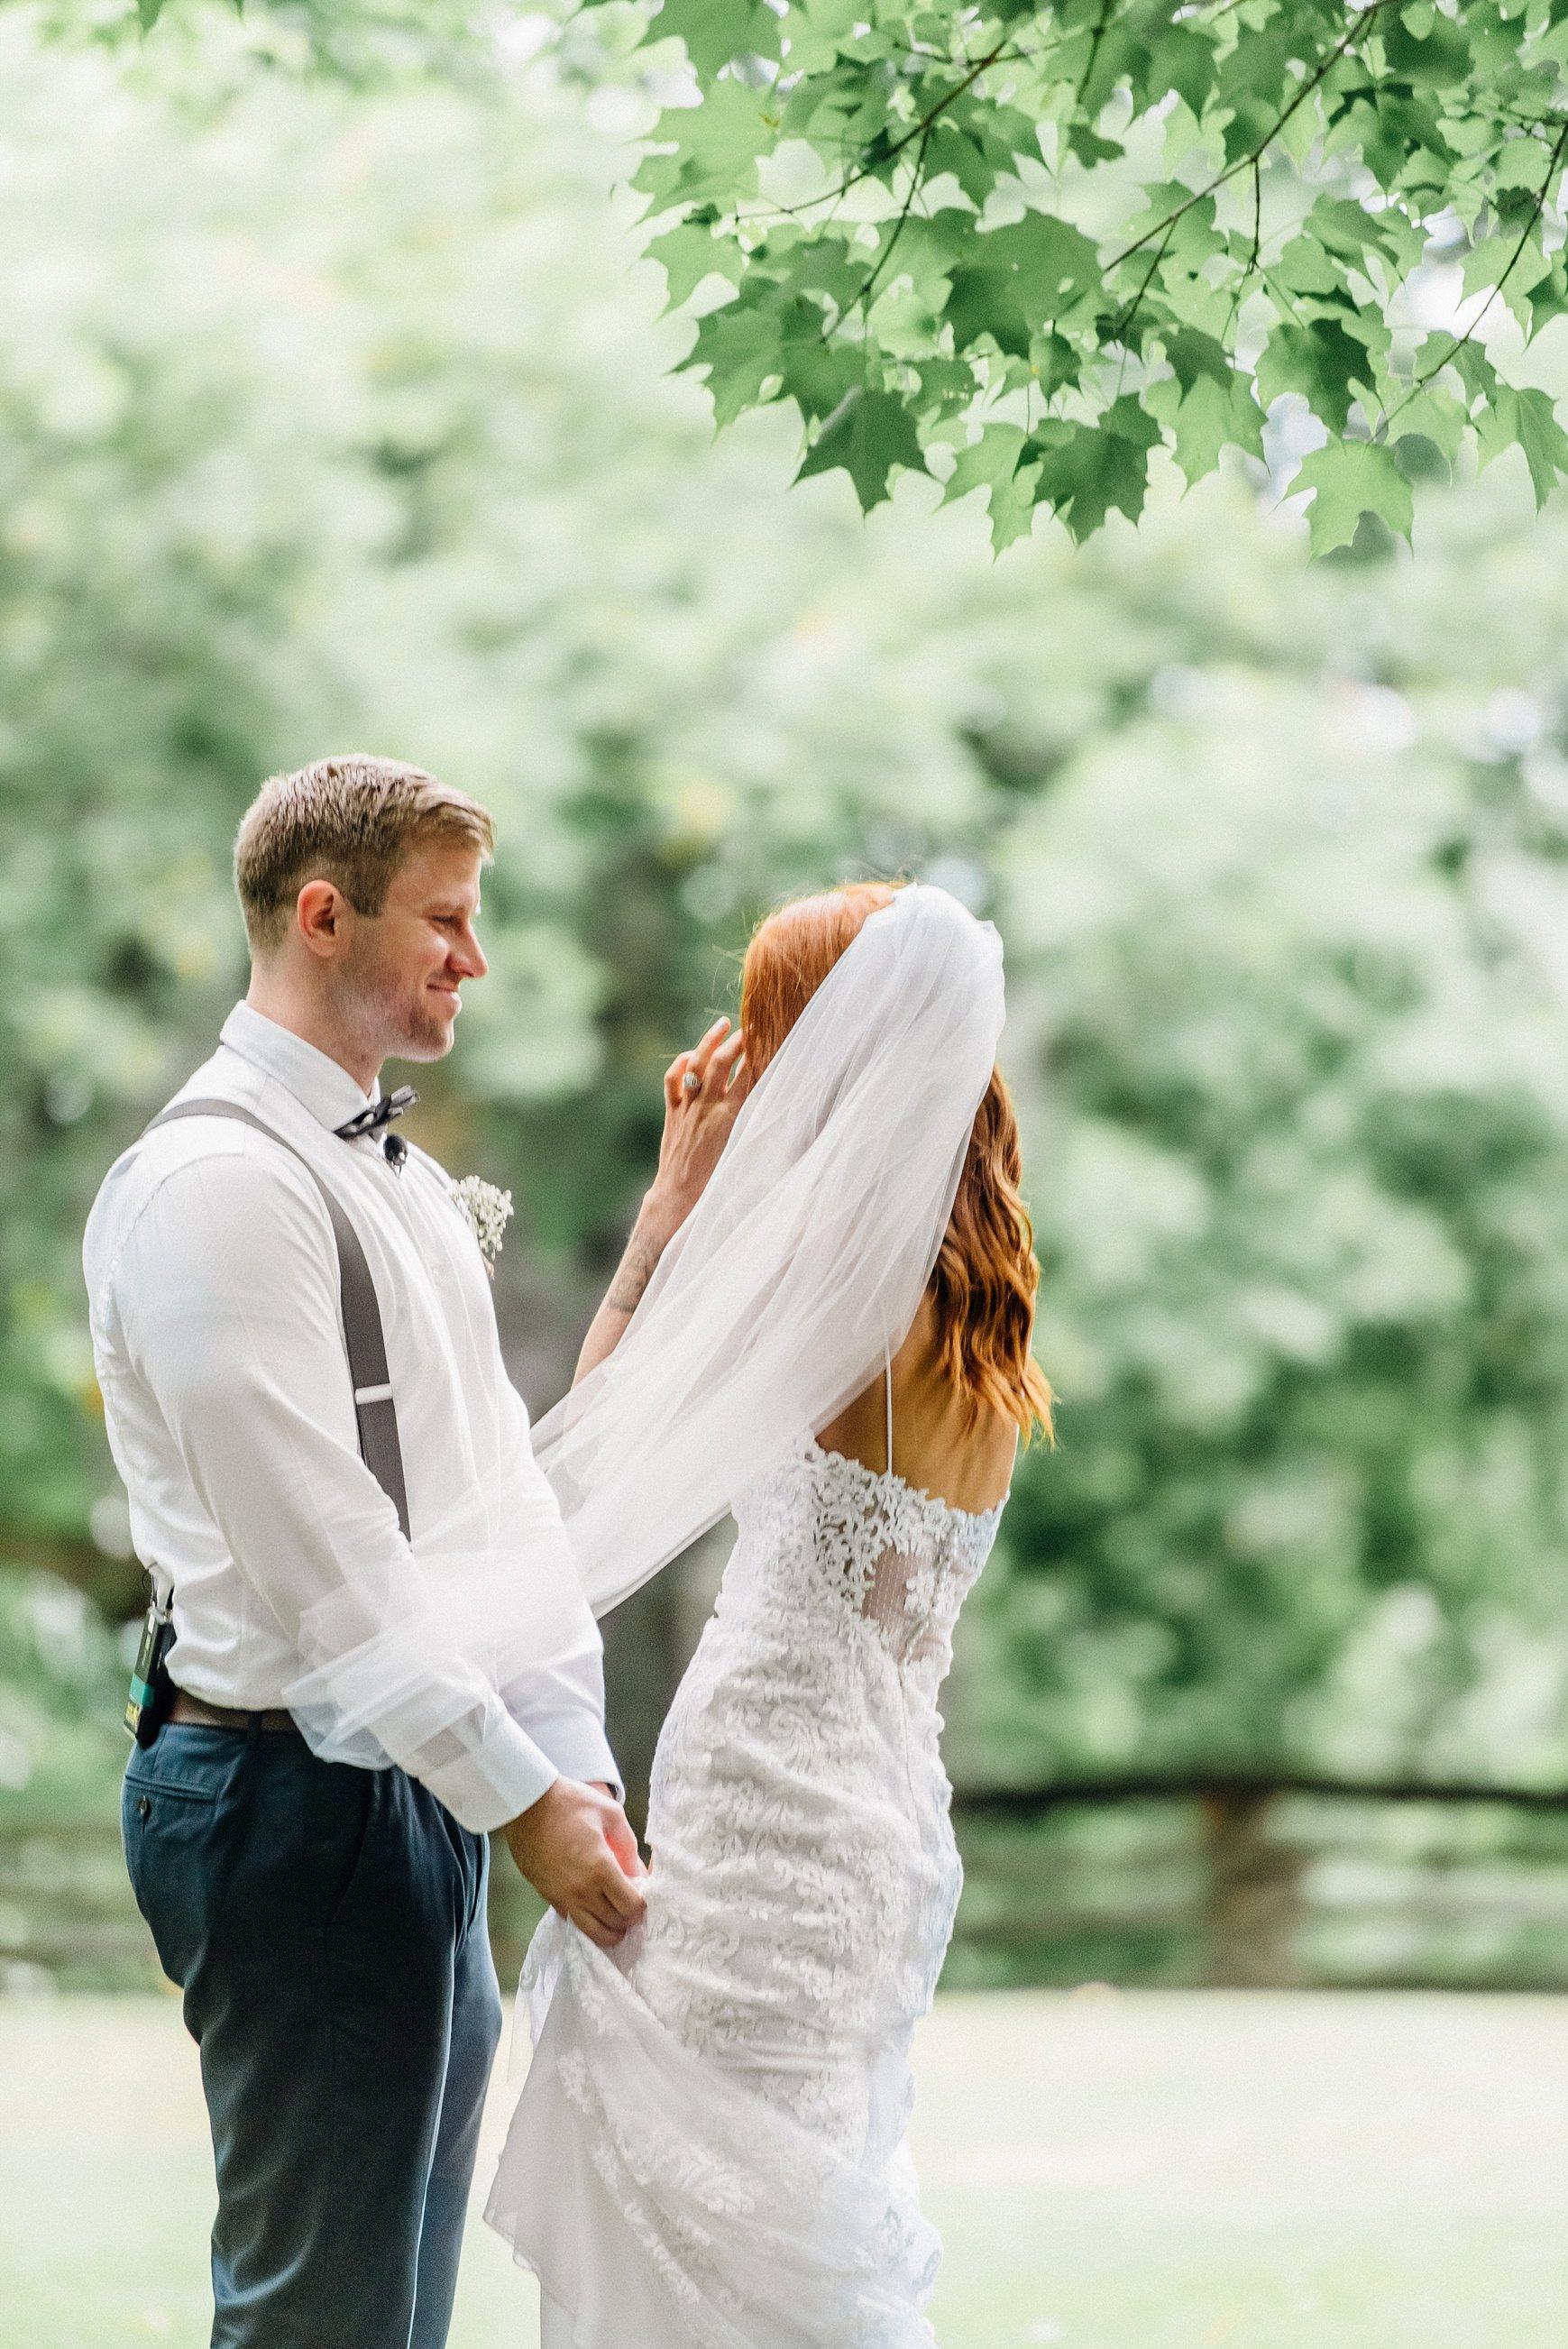 Ottawa Wedding Photographer - Stanley's Olde Maple Lane Barn Wedding - Ali & Batoul Photography_0036.jpg